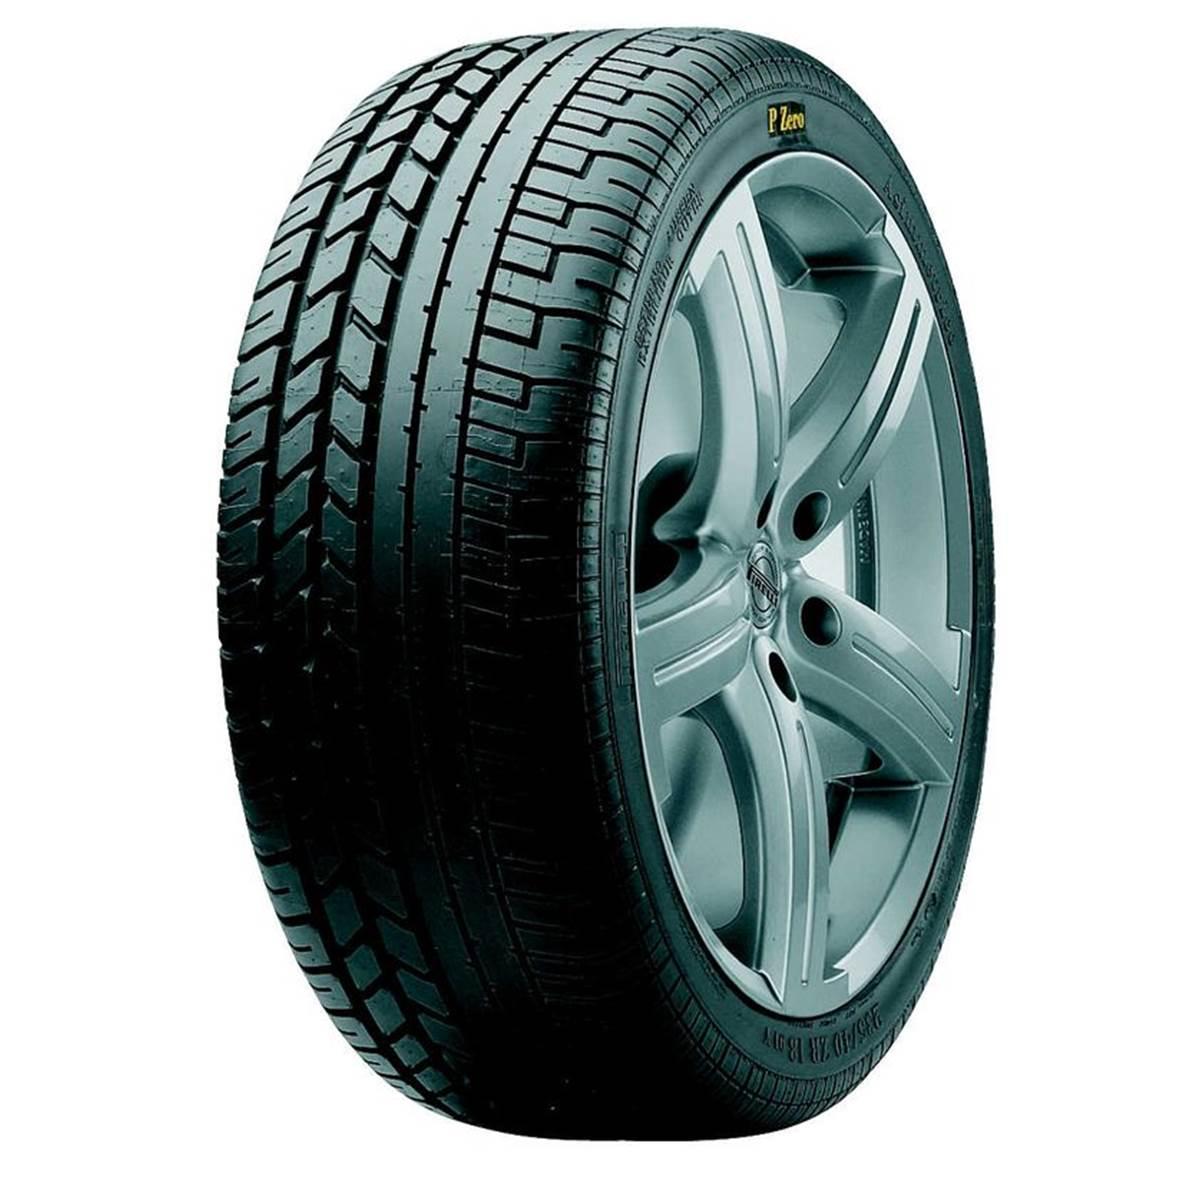 Pneu Pirelli 215/50R17 91Y Pzero Asimmetrico